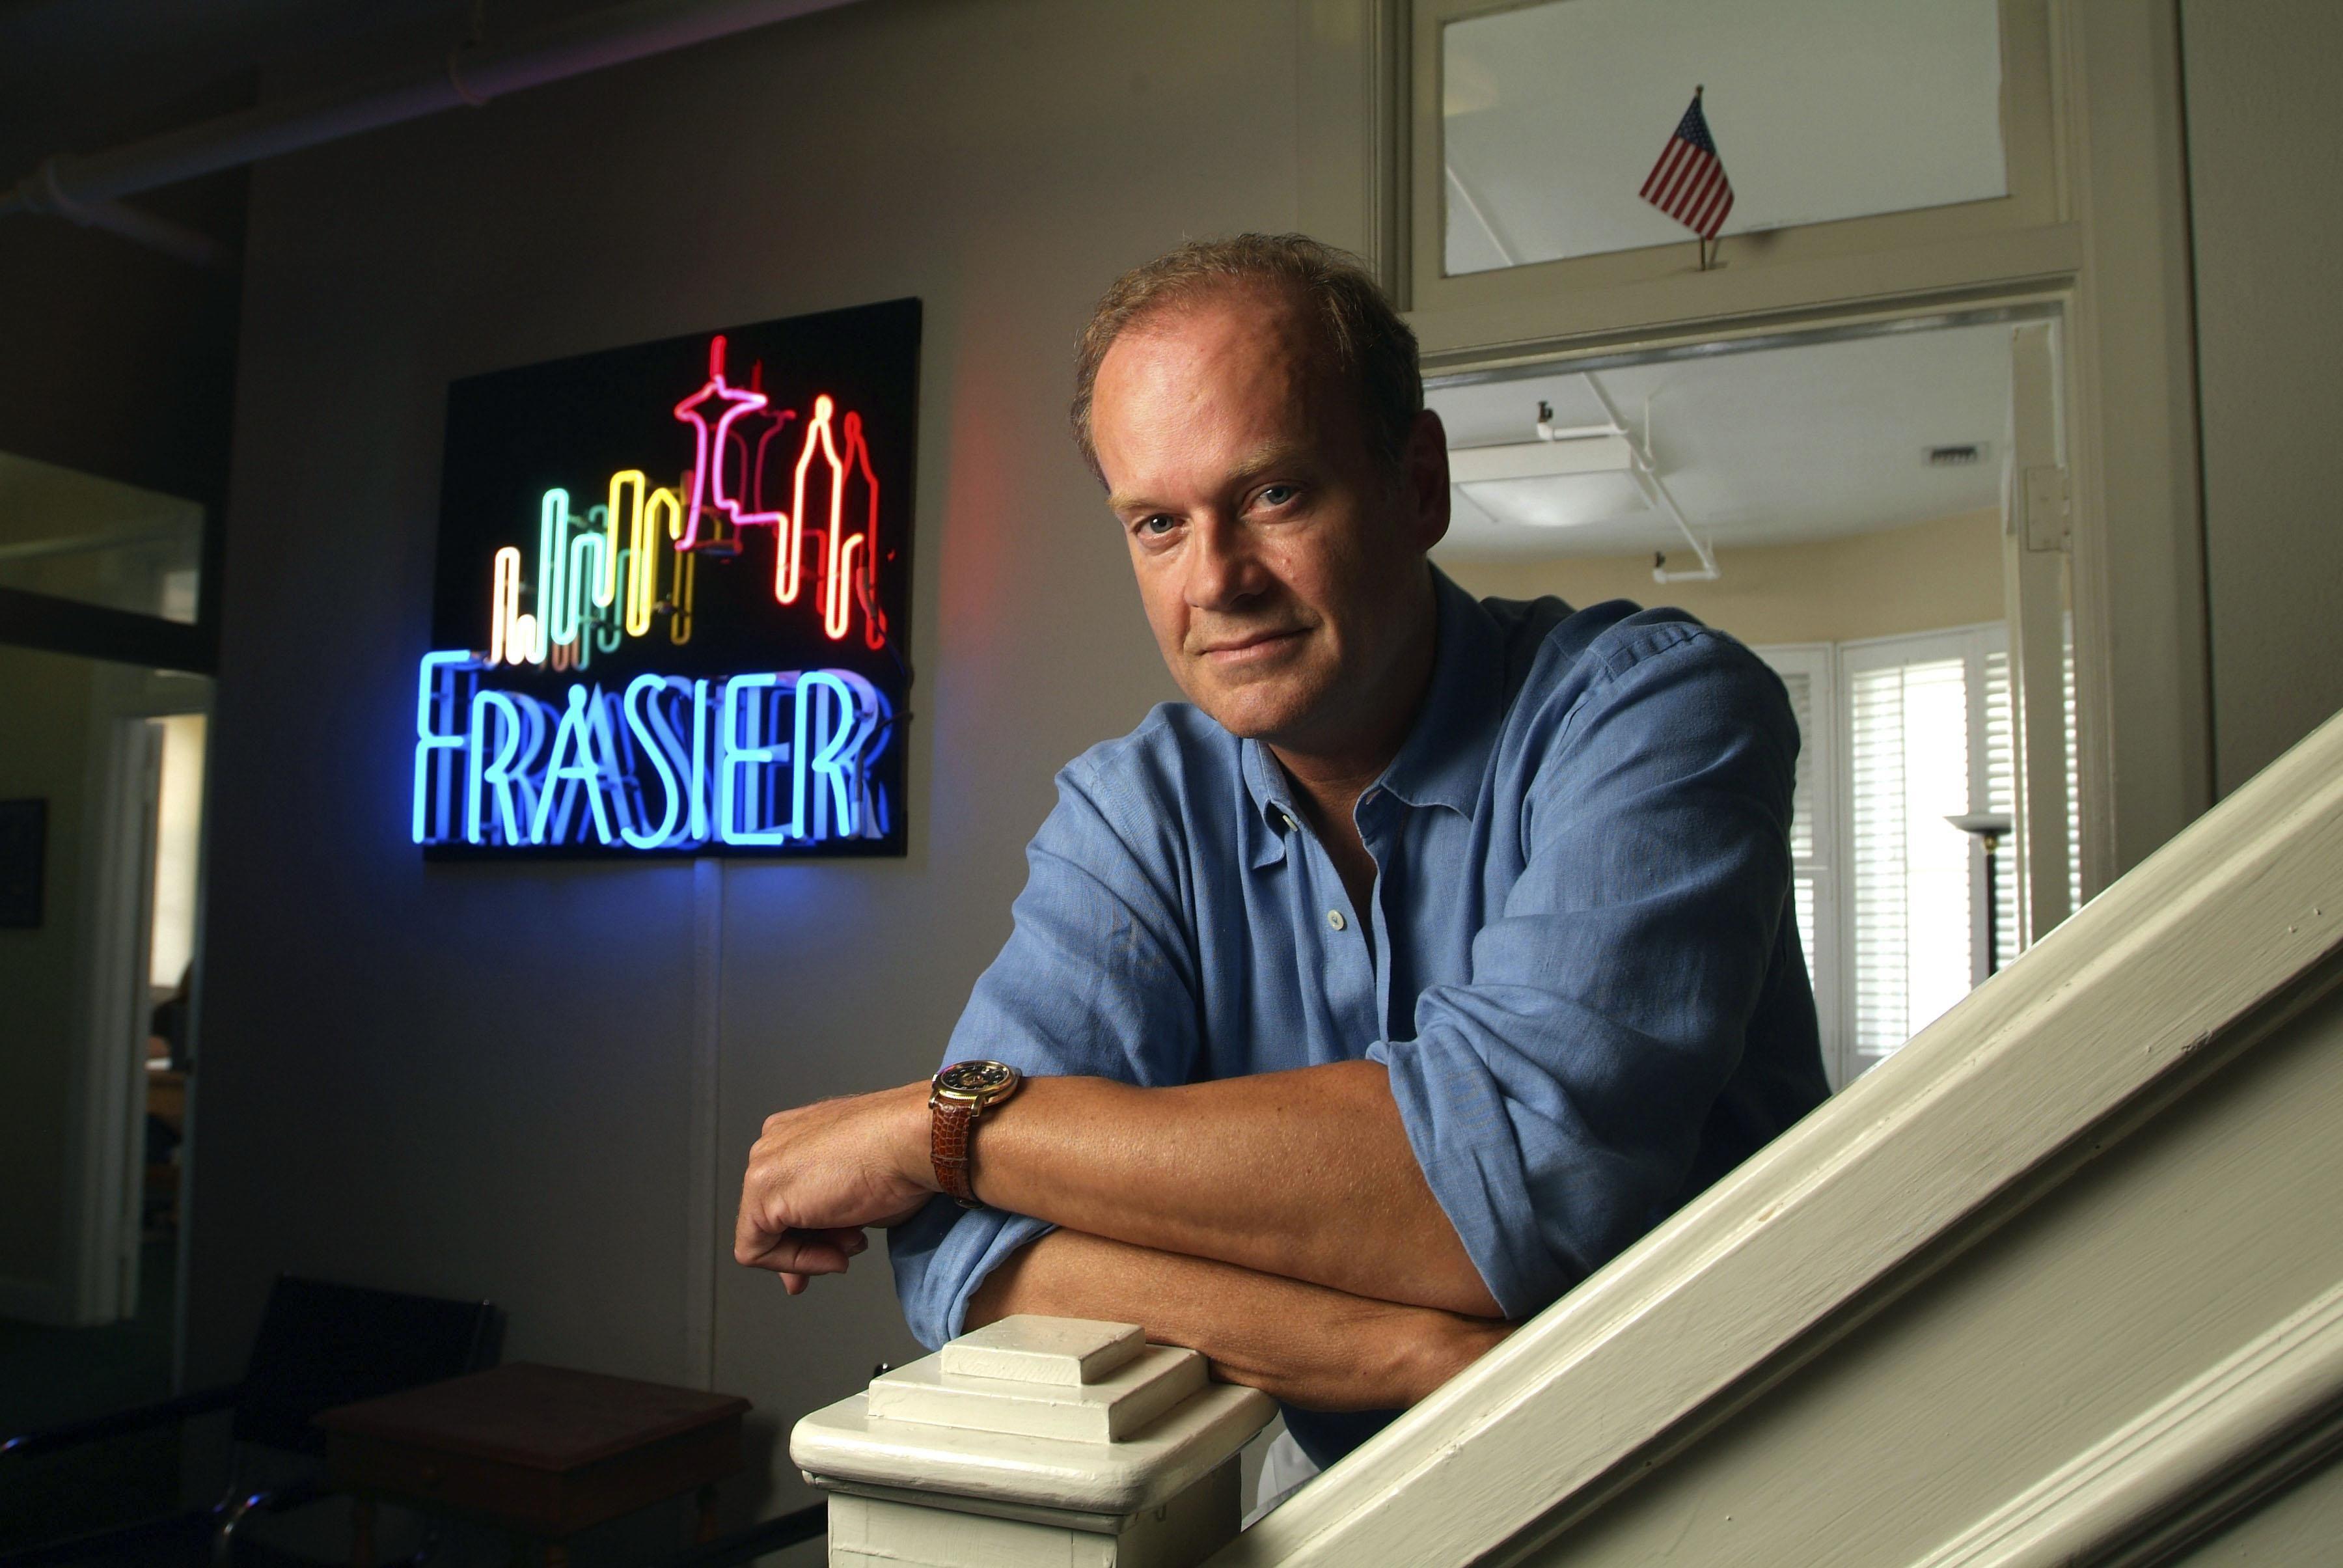 Frasier Nueva Serie - Kelsey Grammer Habla del Regreso de Frasier